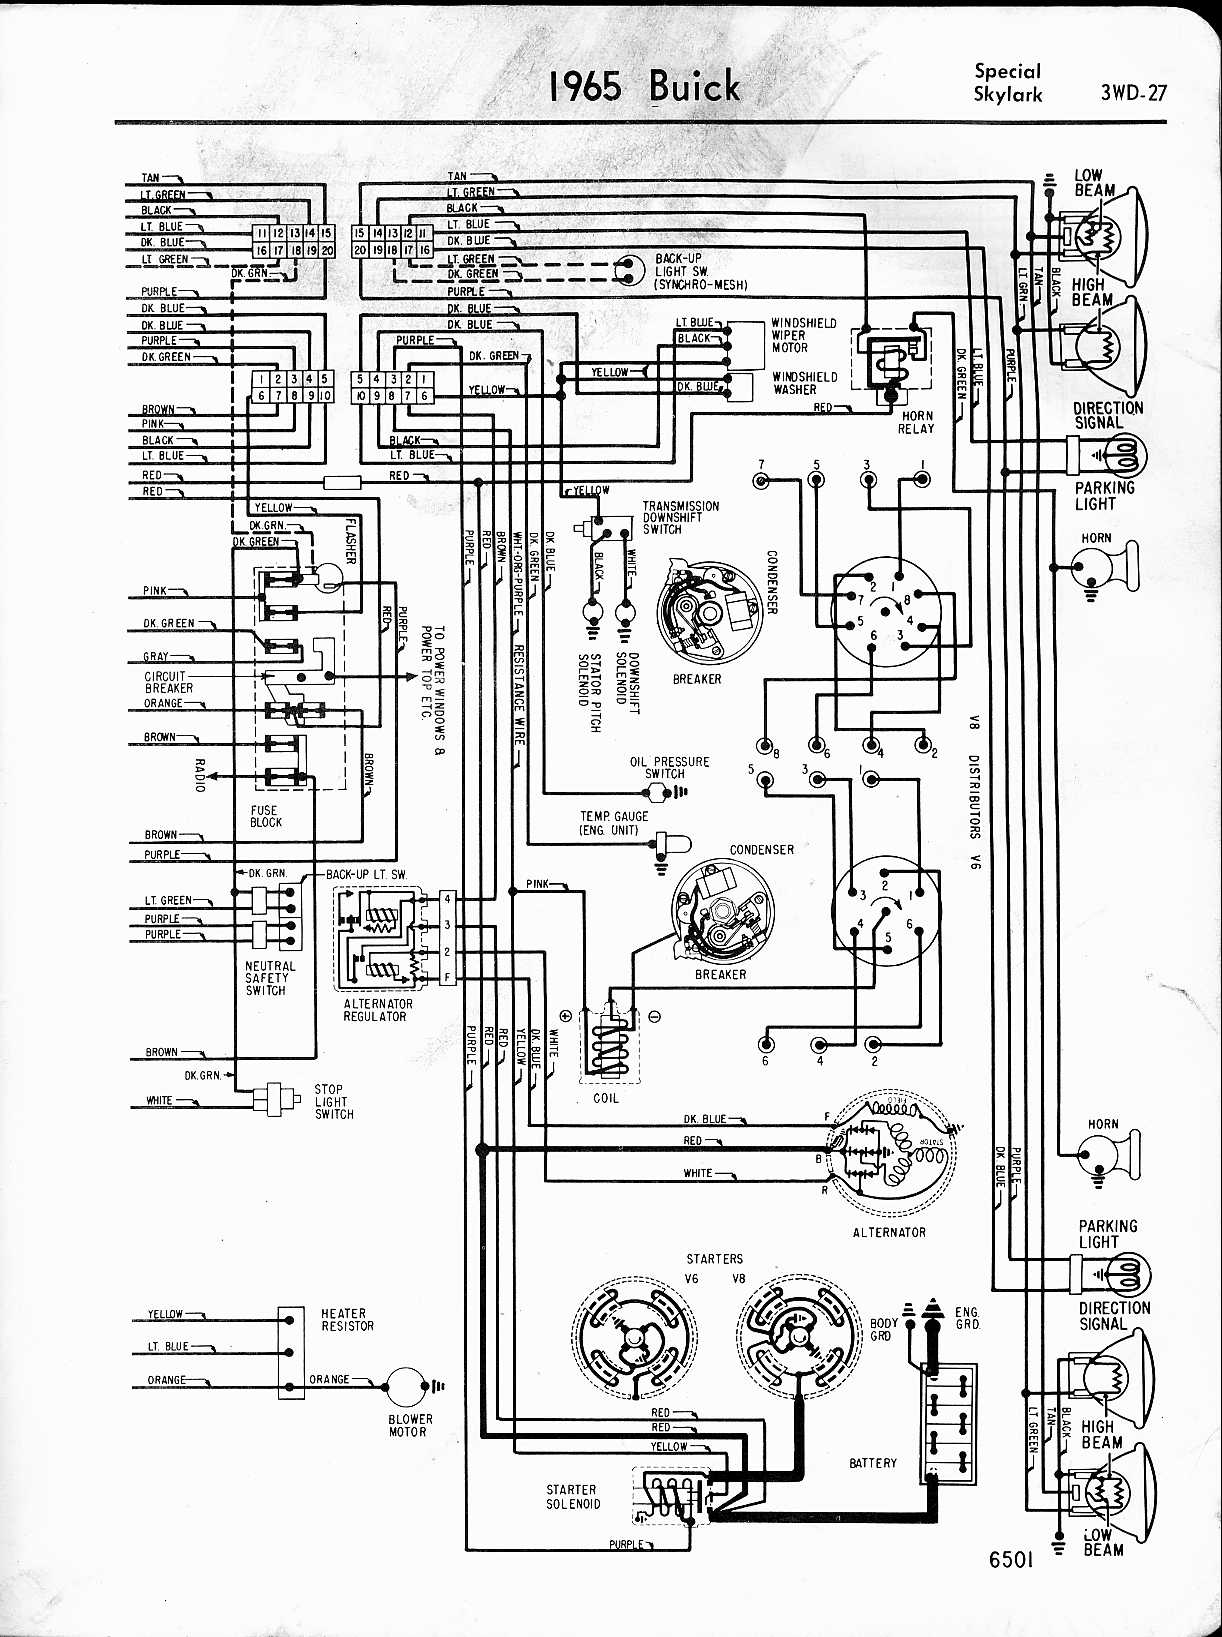 Tremendous Wiring Diagram 1966 Buick Wildcat And Electra Wiring Diagram Wiring 101 Mecadwellnesstrialsorg